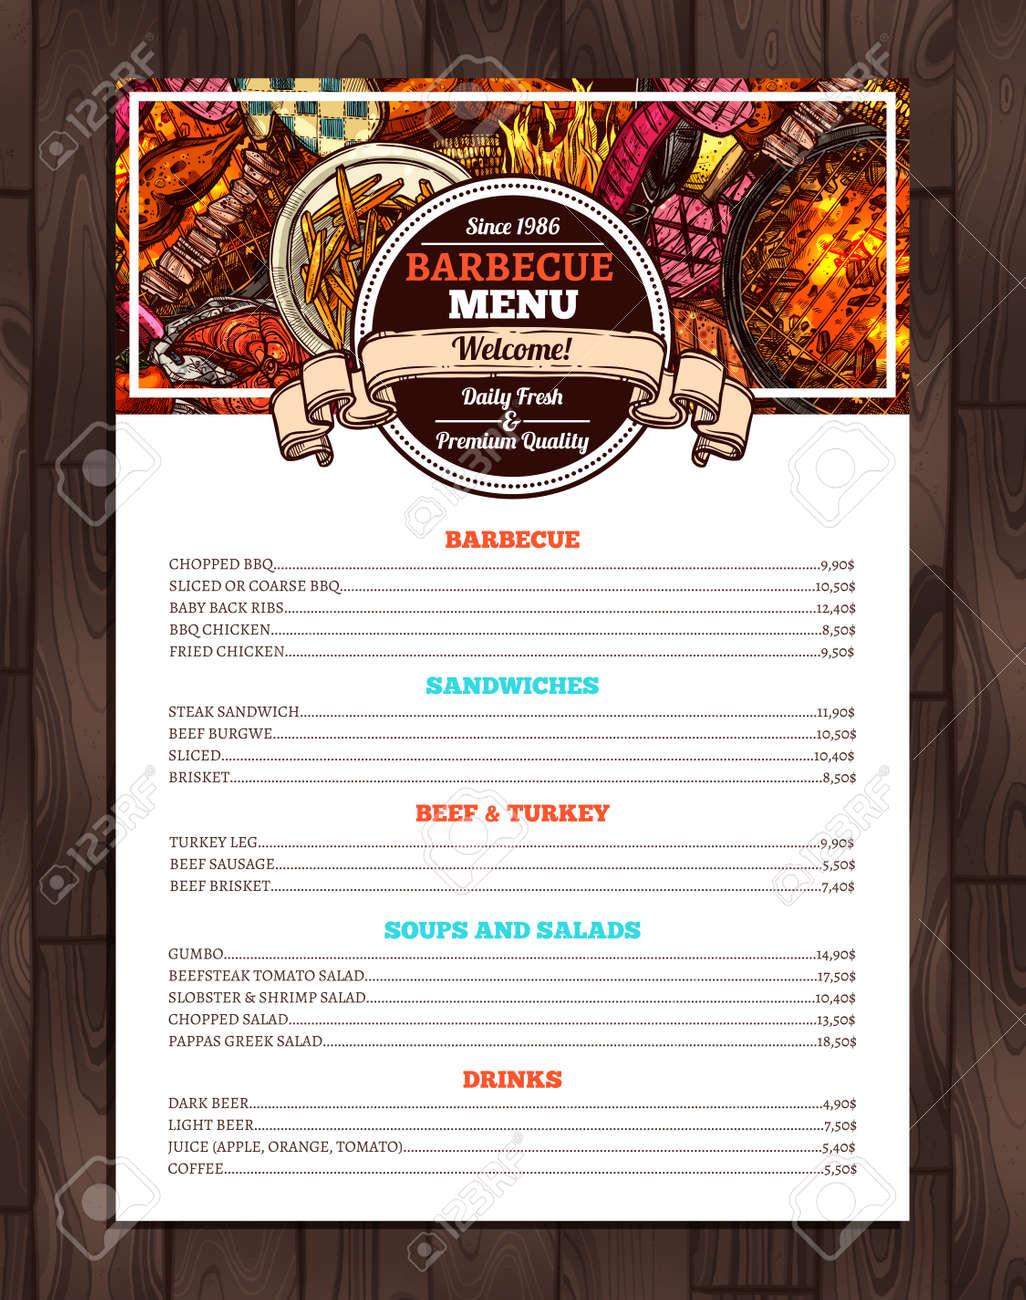 barbecue restaurant menu template design of bbq brochure royalty